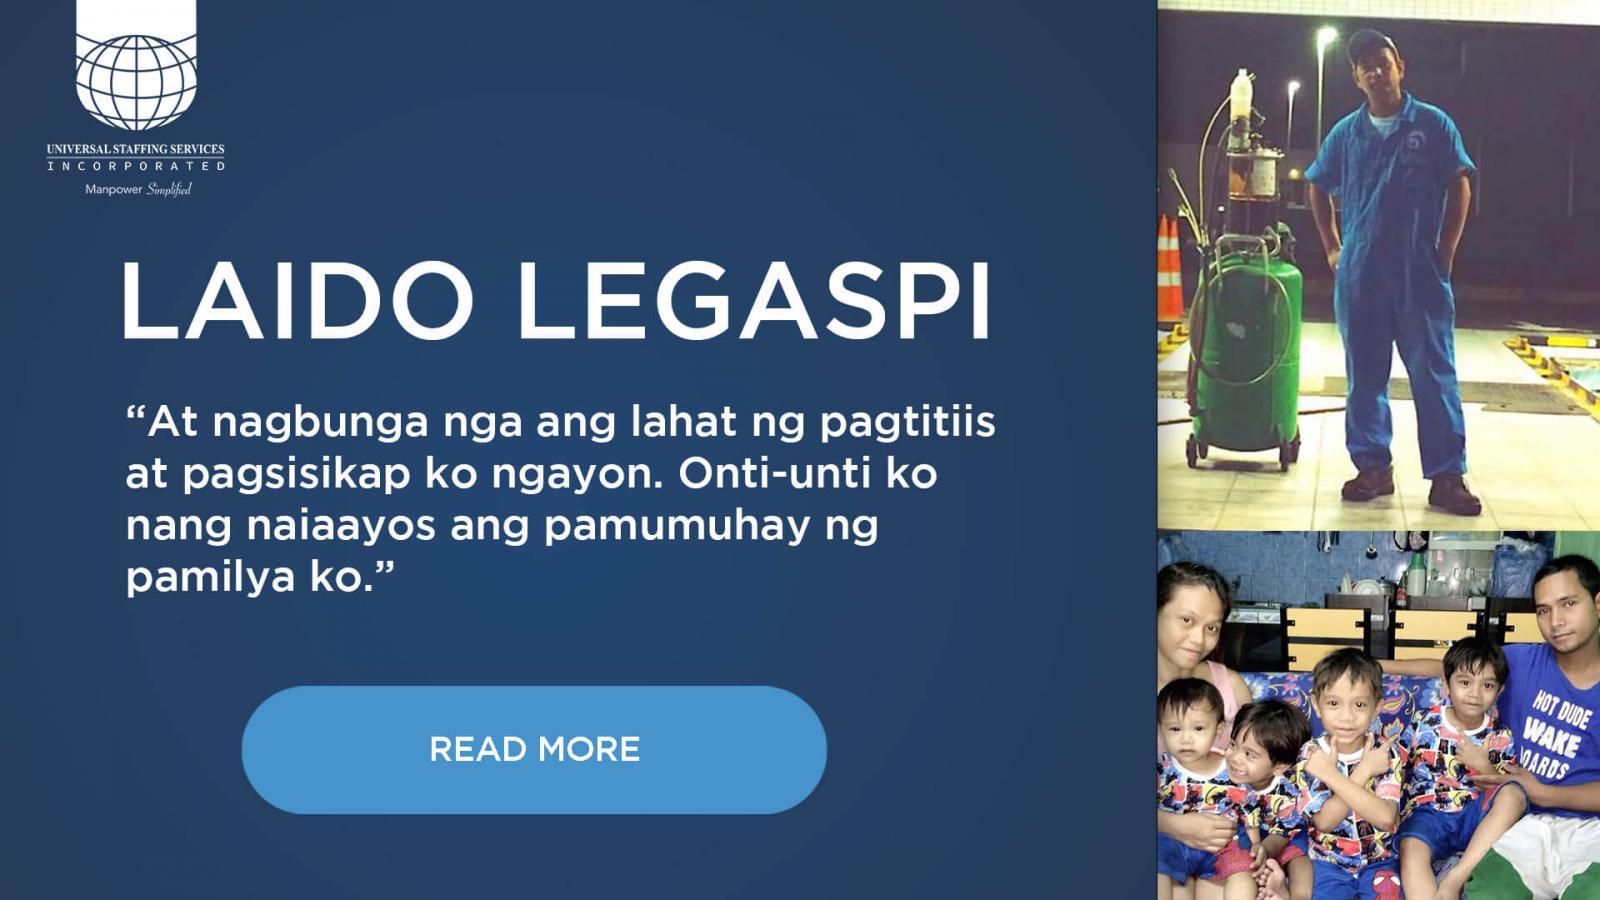 Laido Legaspi